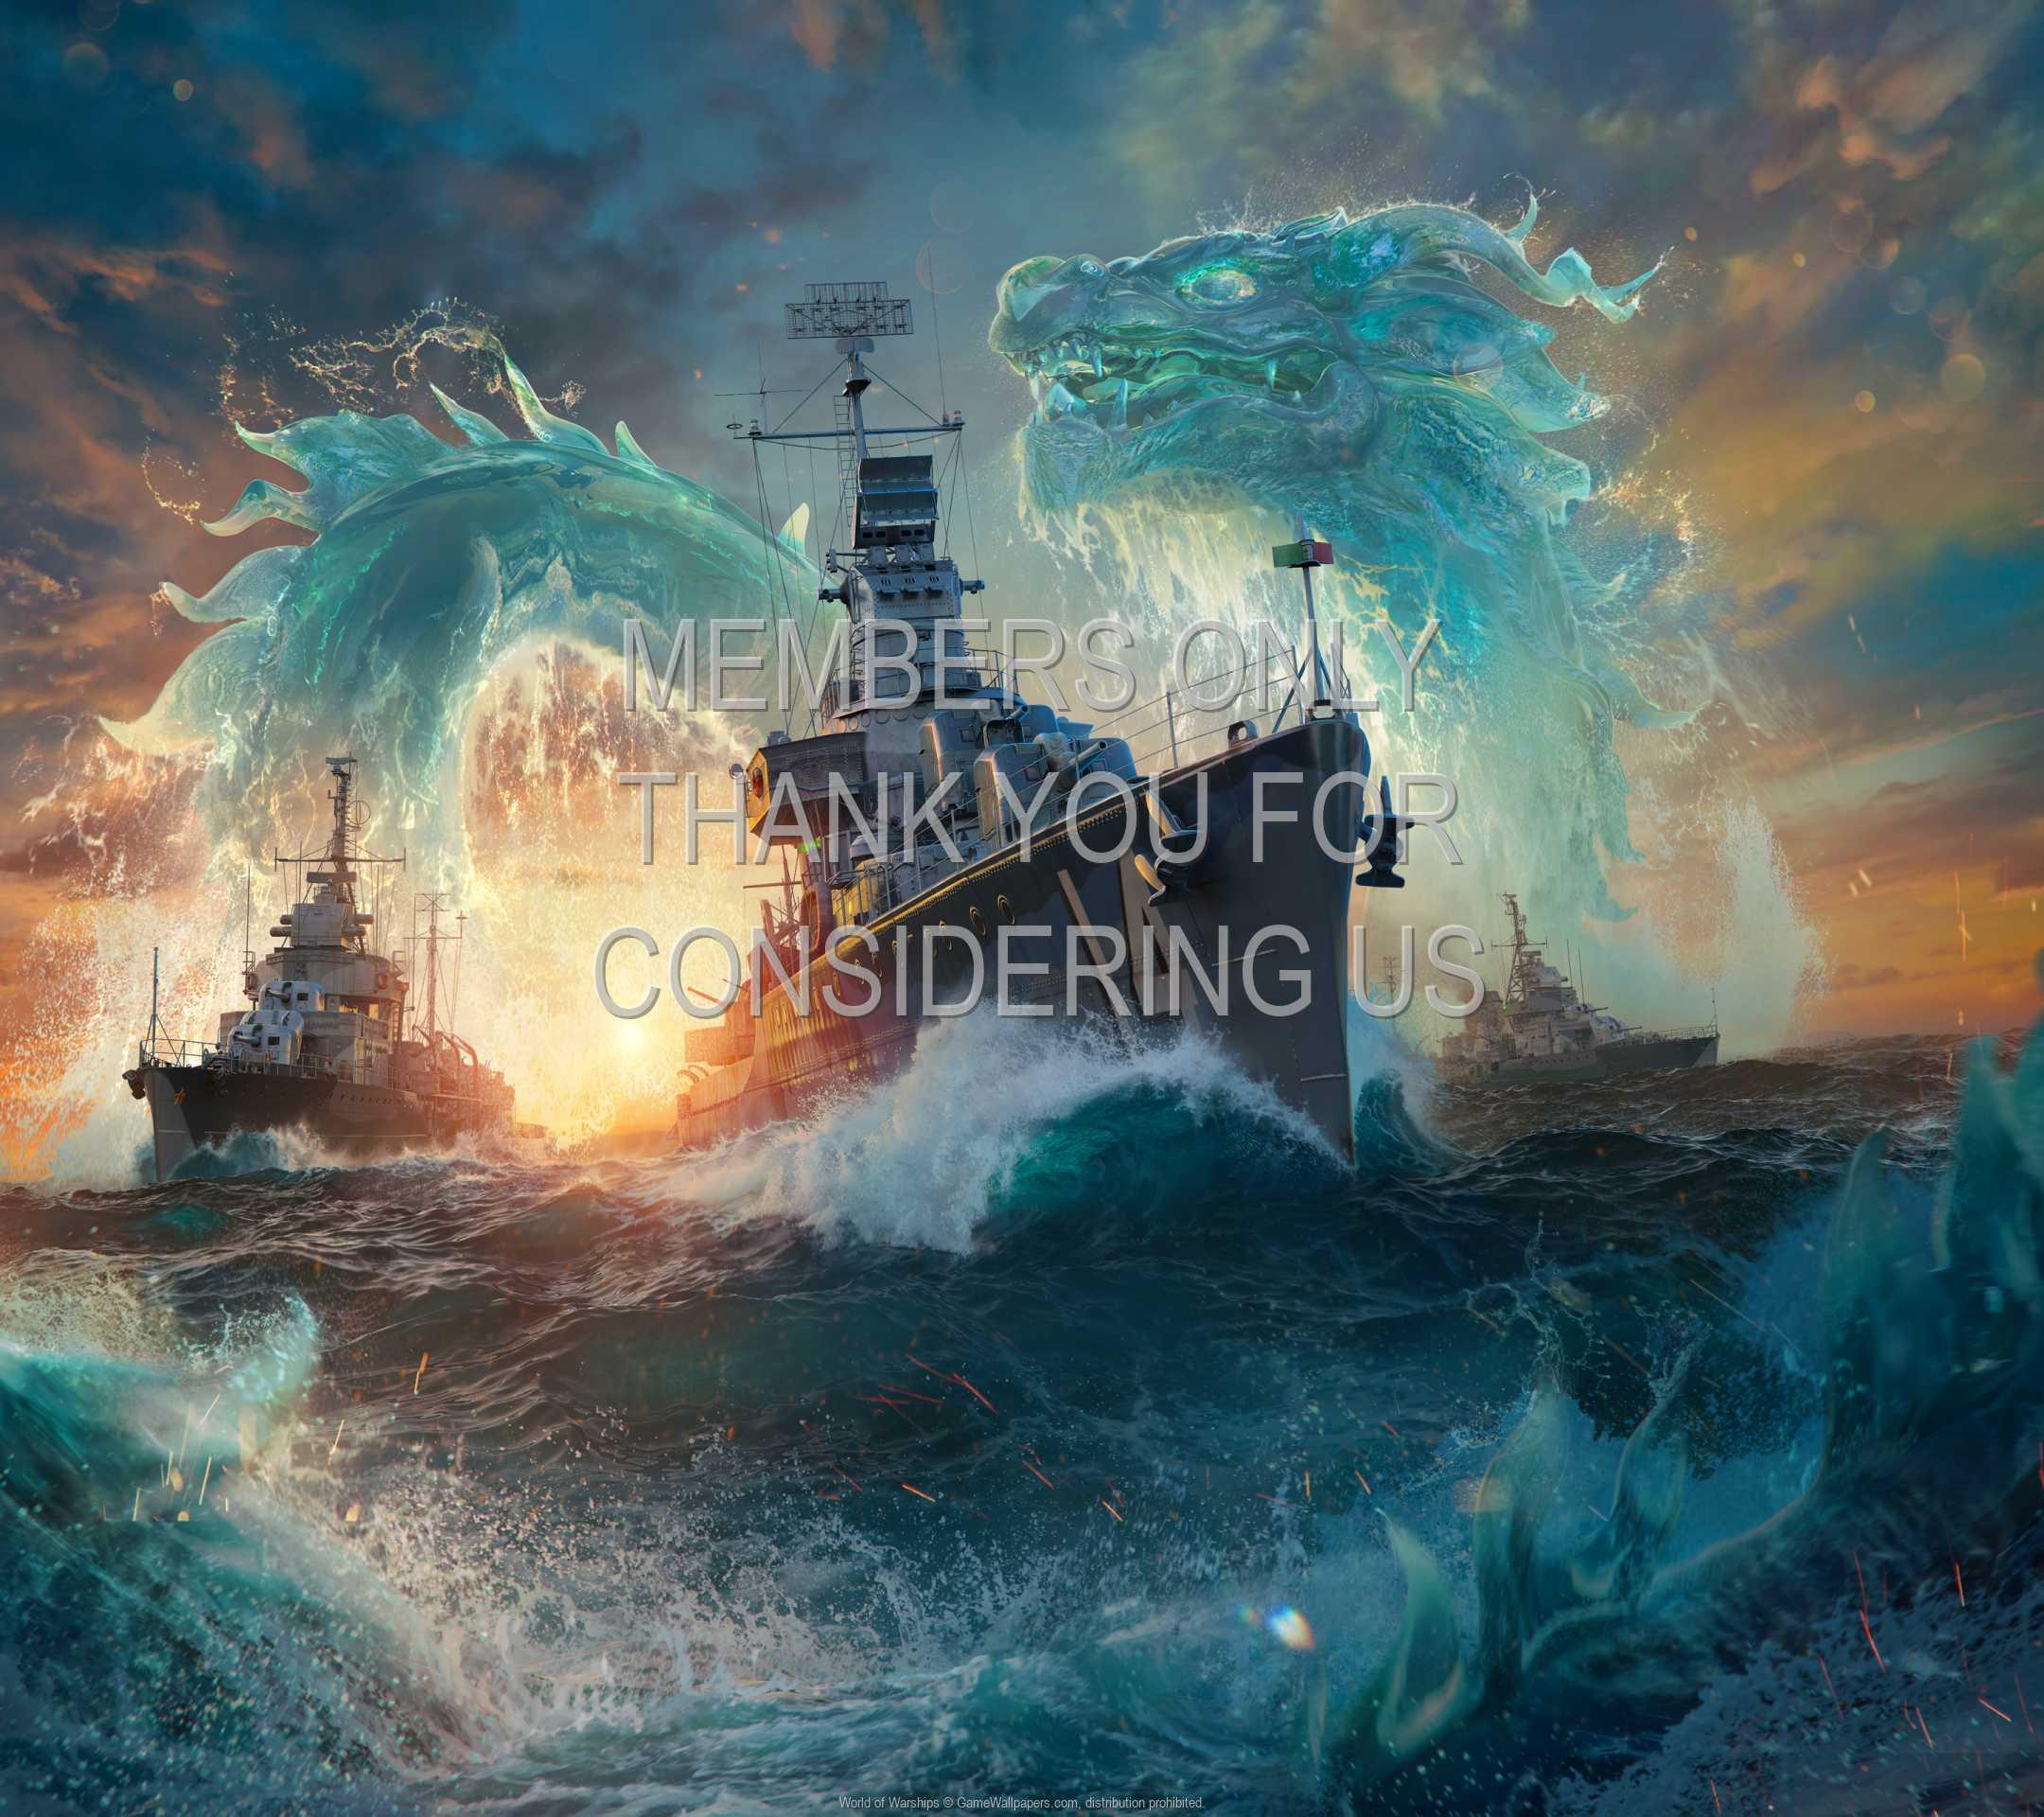 World of Warships 1080p Horizontal Mobile wallpaper or background 17